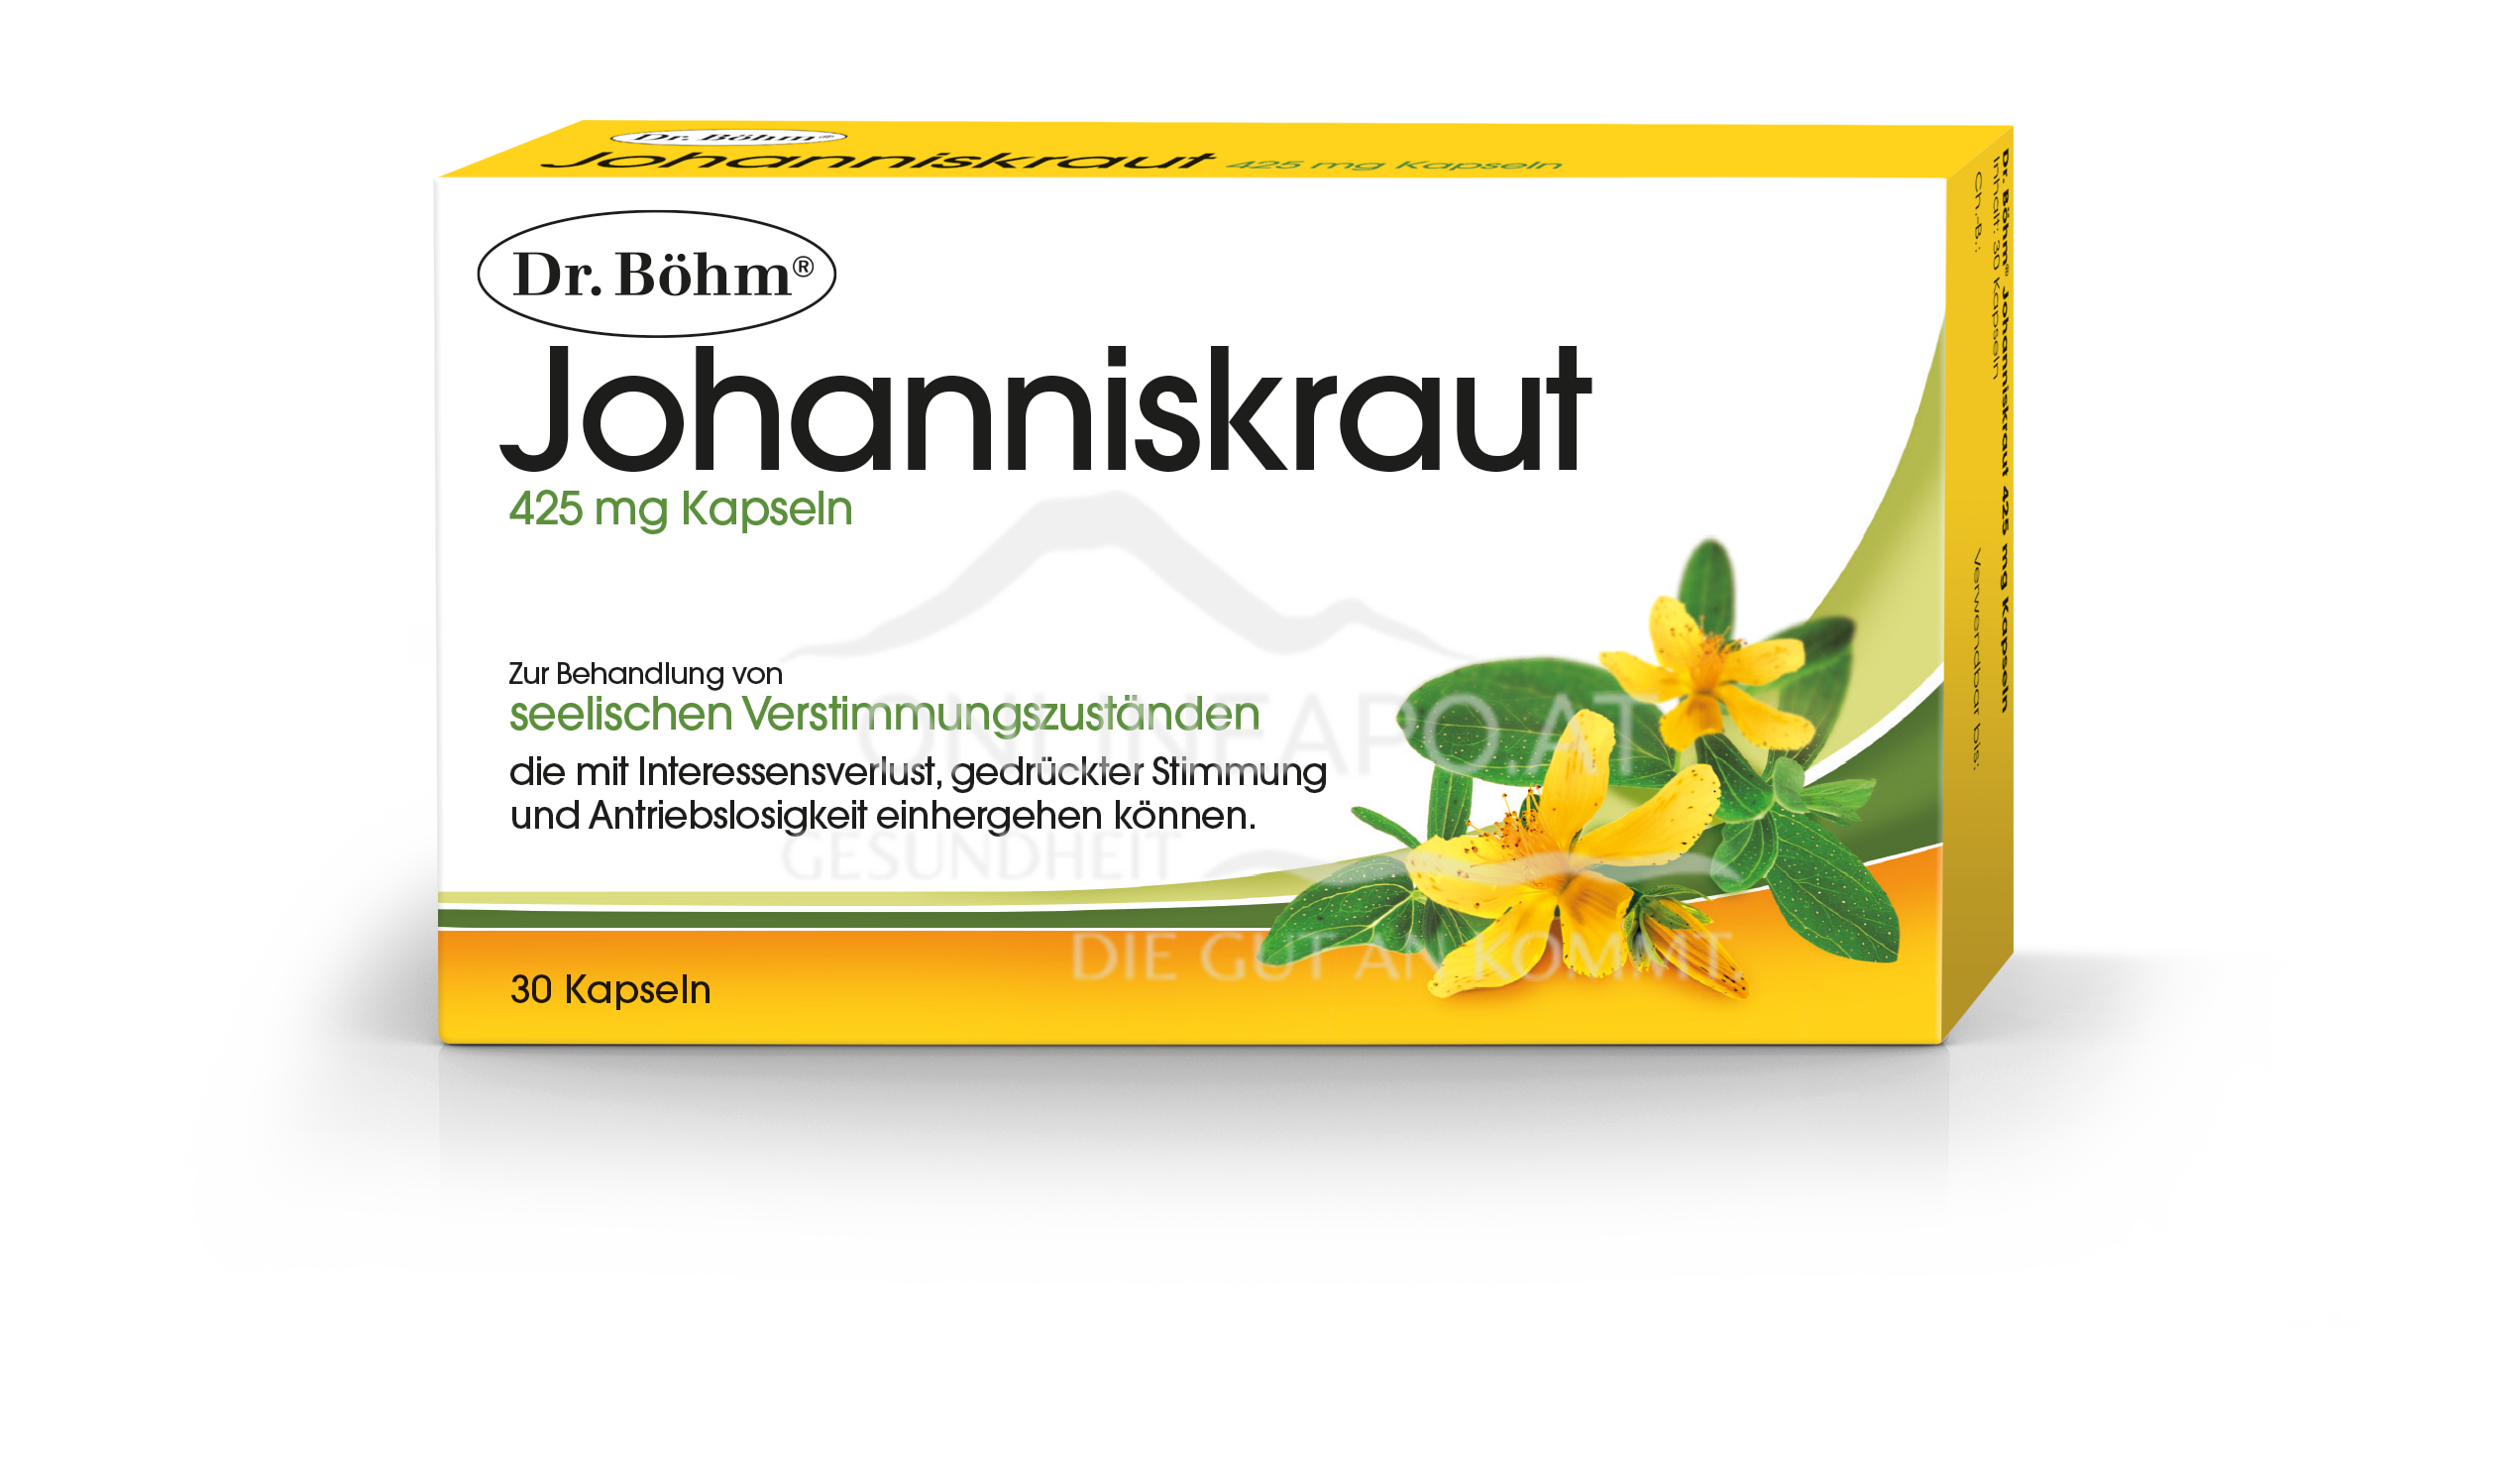 Dr. Böhm® Johanniskraut 425mg